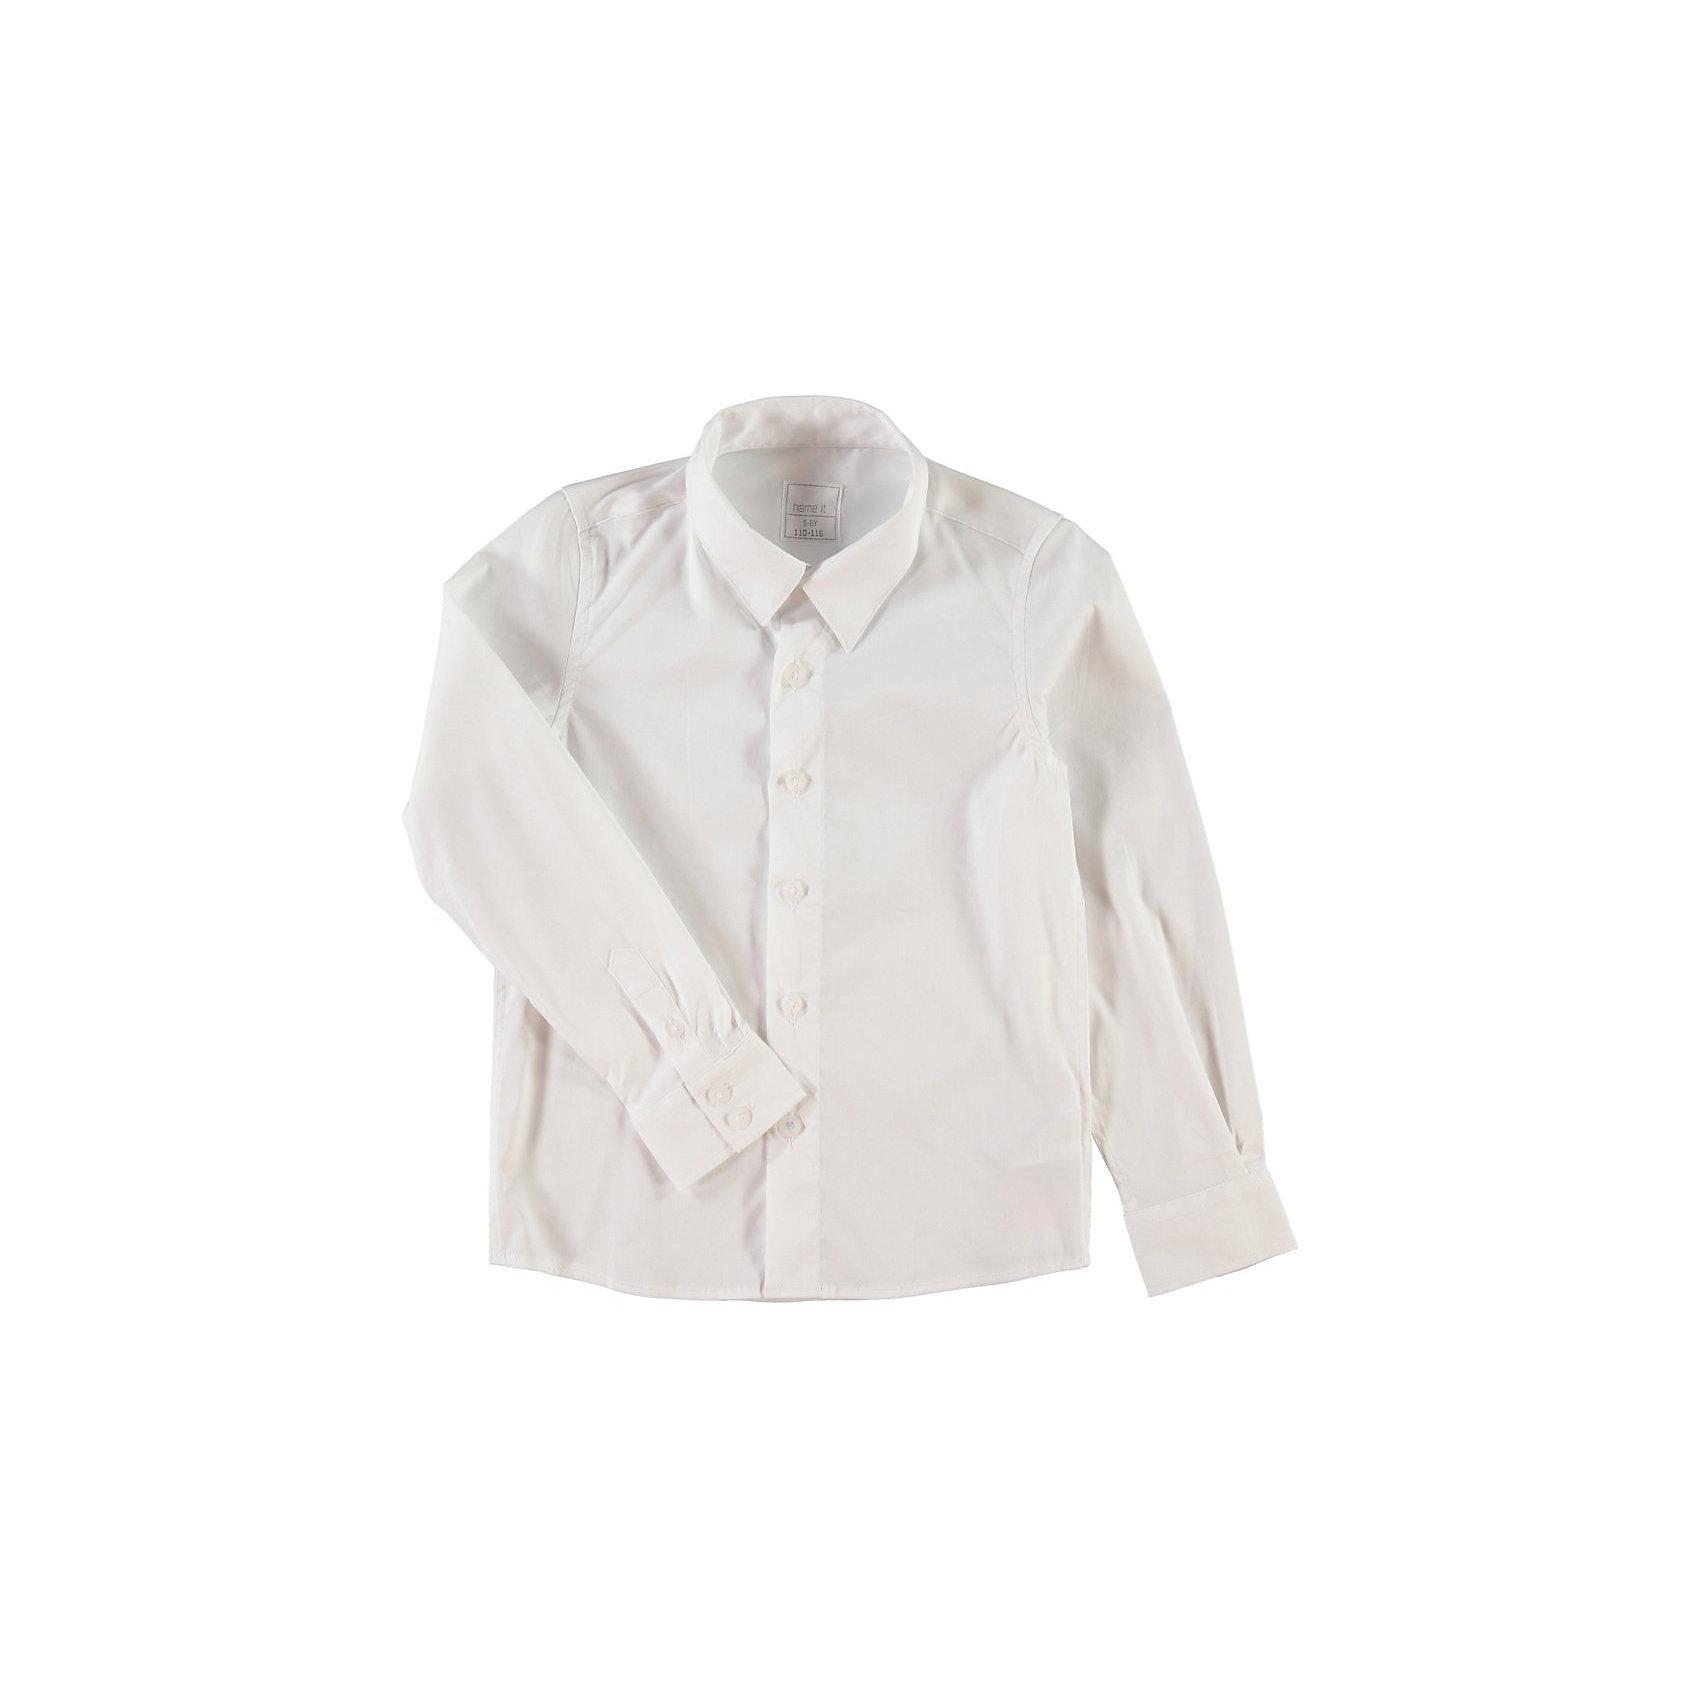 Рубашка для мальчика name it